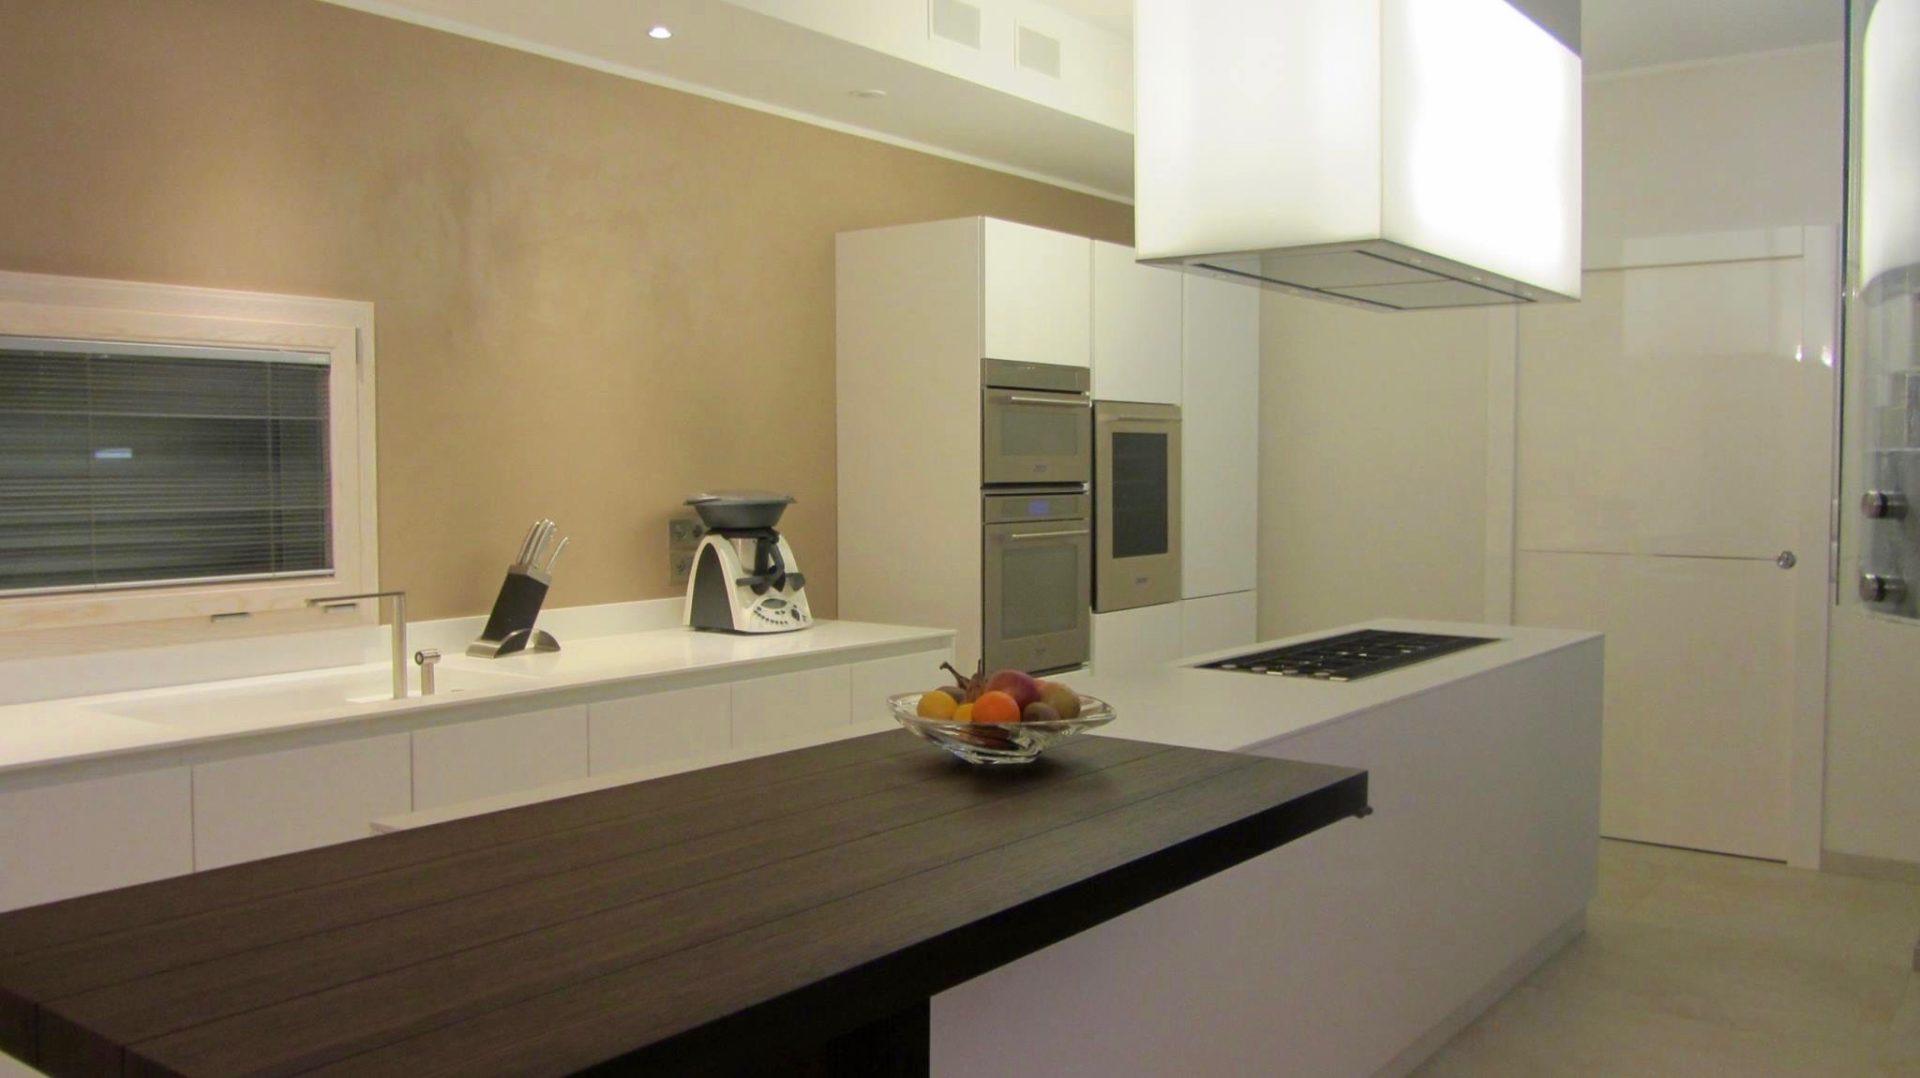 Cucina con isola e snack in residenza a bellaria segni d - Spessore top cucina ...